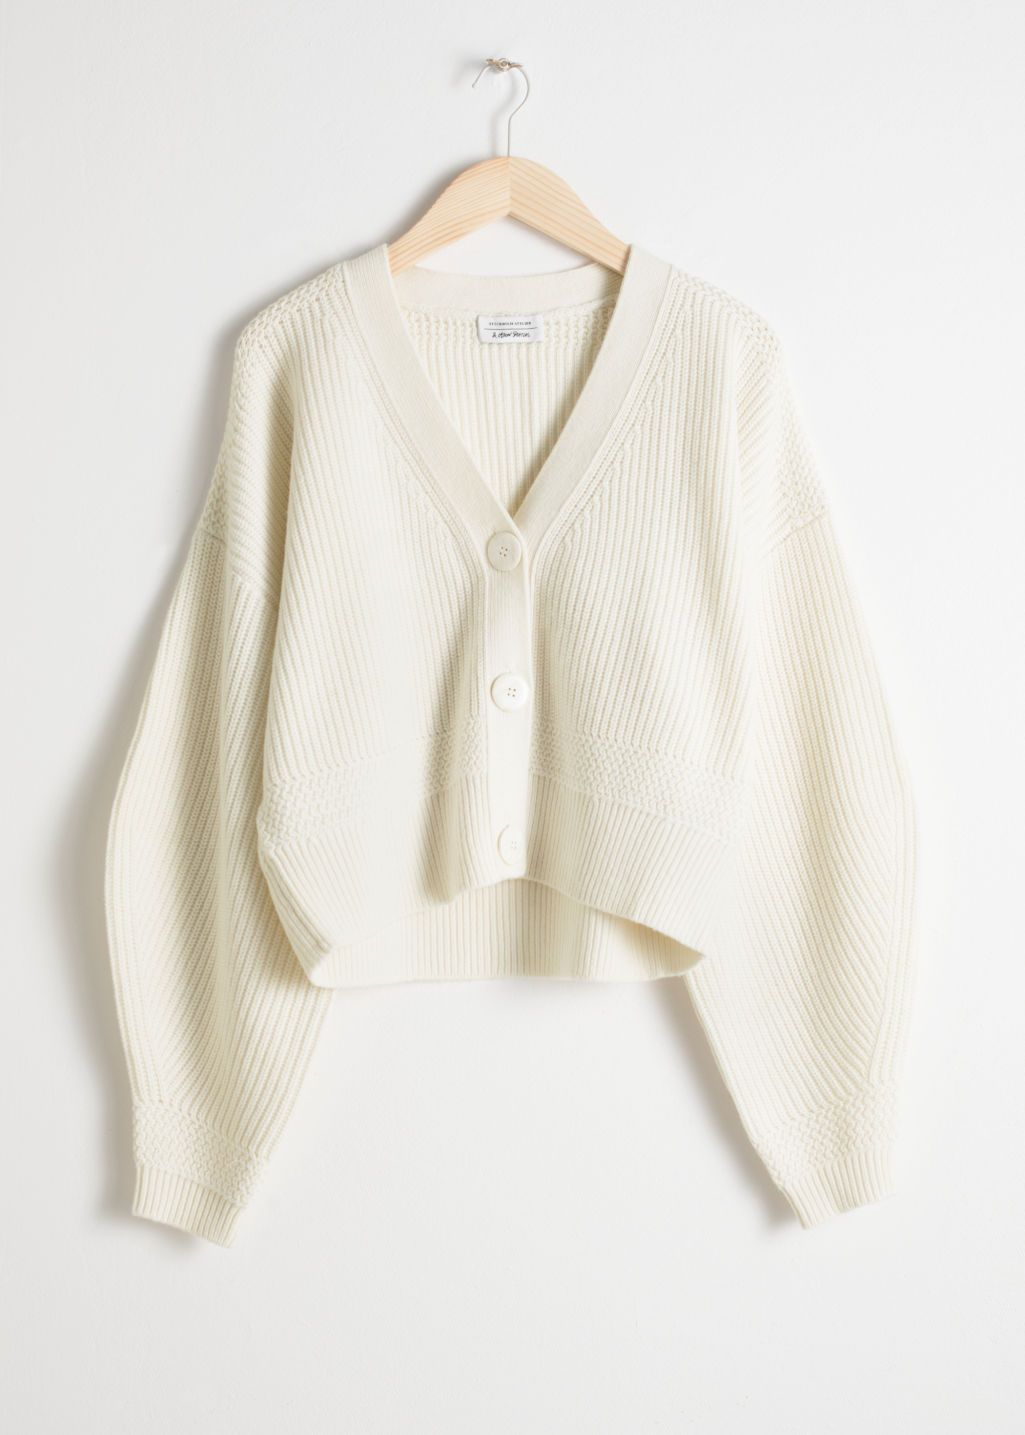 Zippered Rib Knit Turtleneck | Cropped cardigan, Cardigan